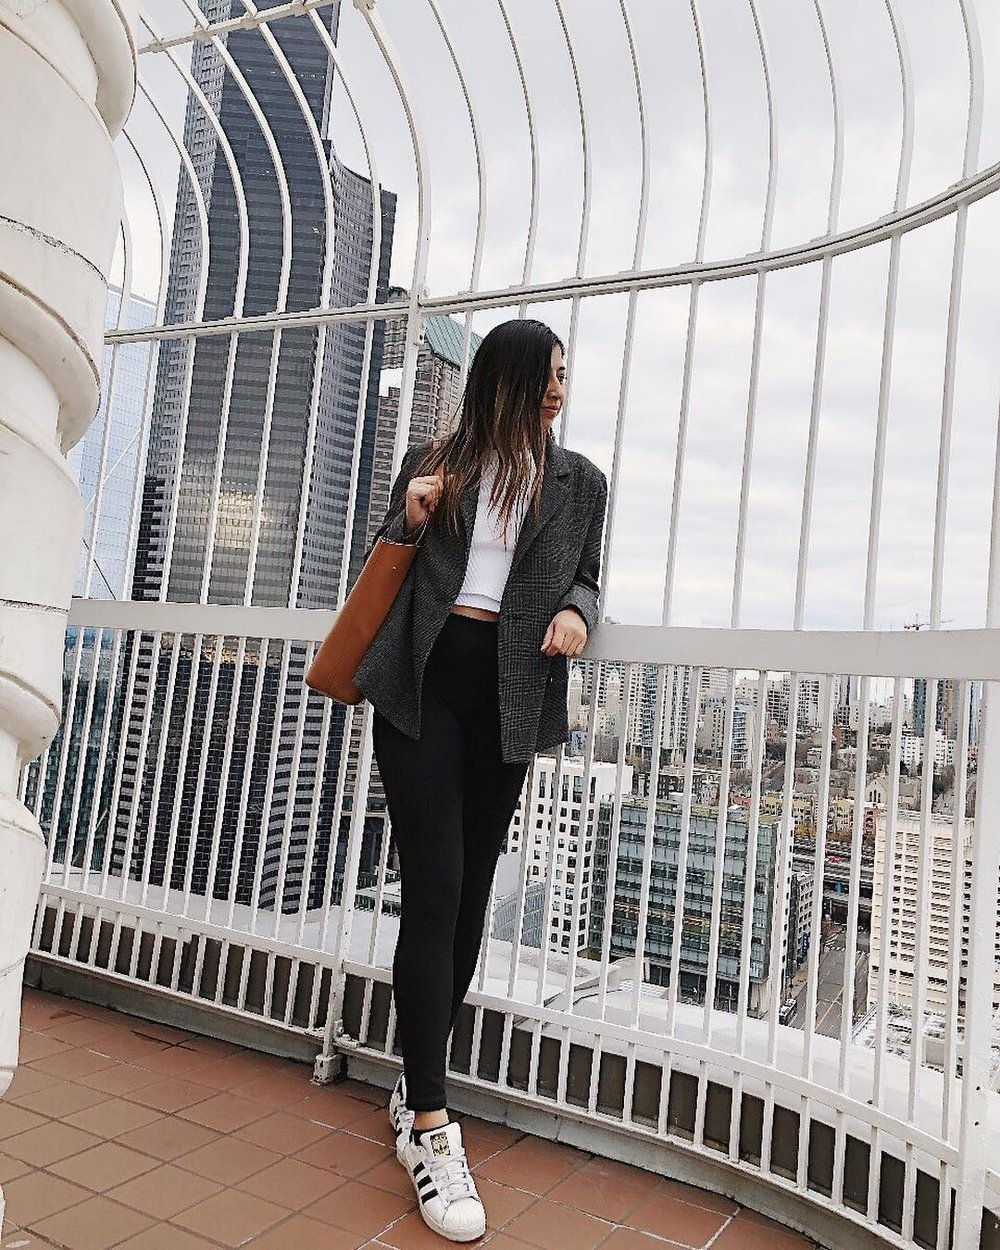 Dressing Up Adidas Classics with a UO Blazer — Love ee4ec0453006f